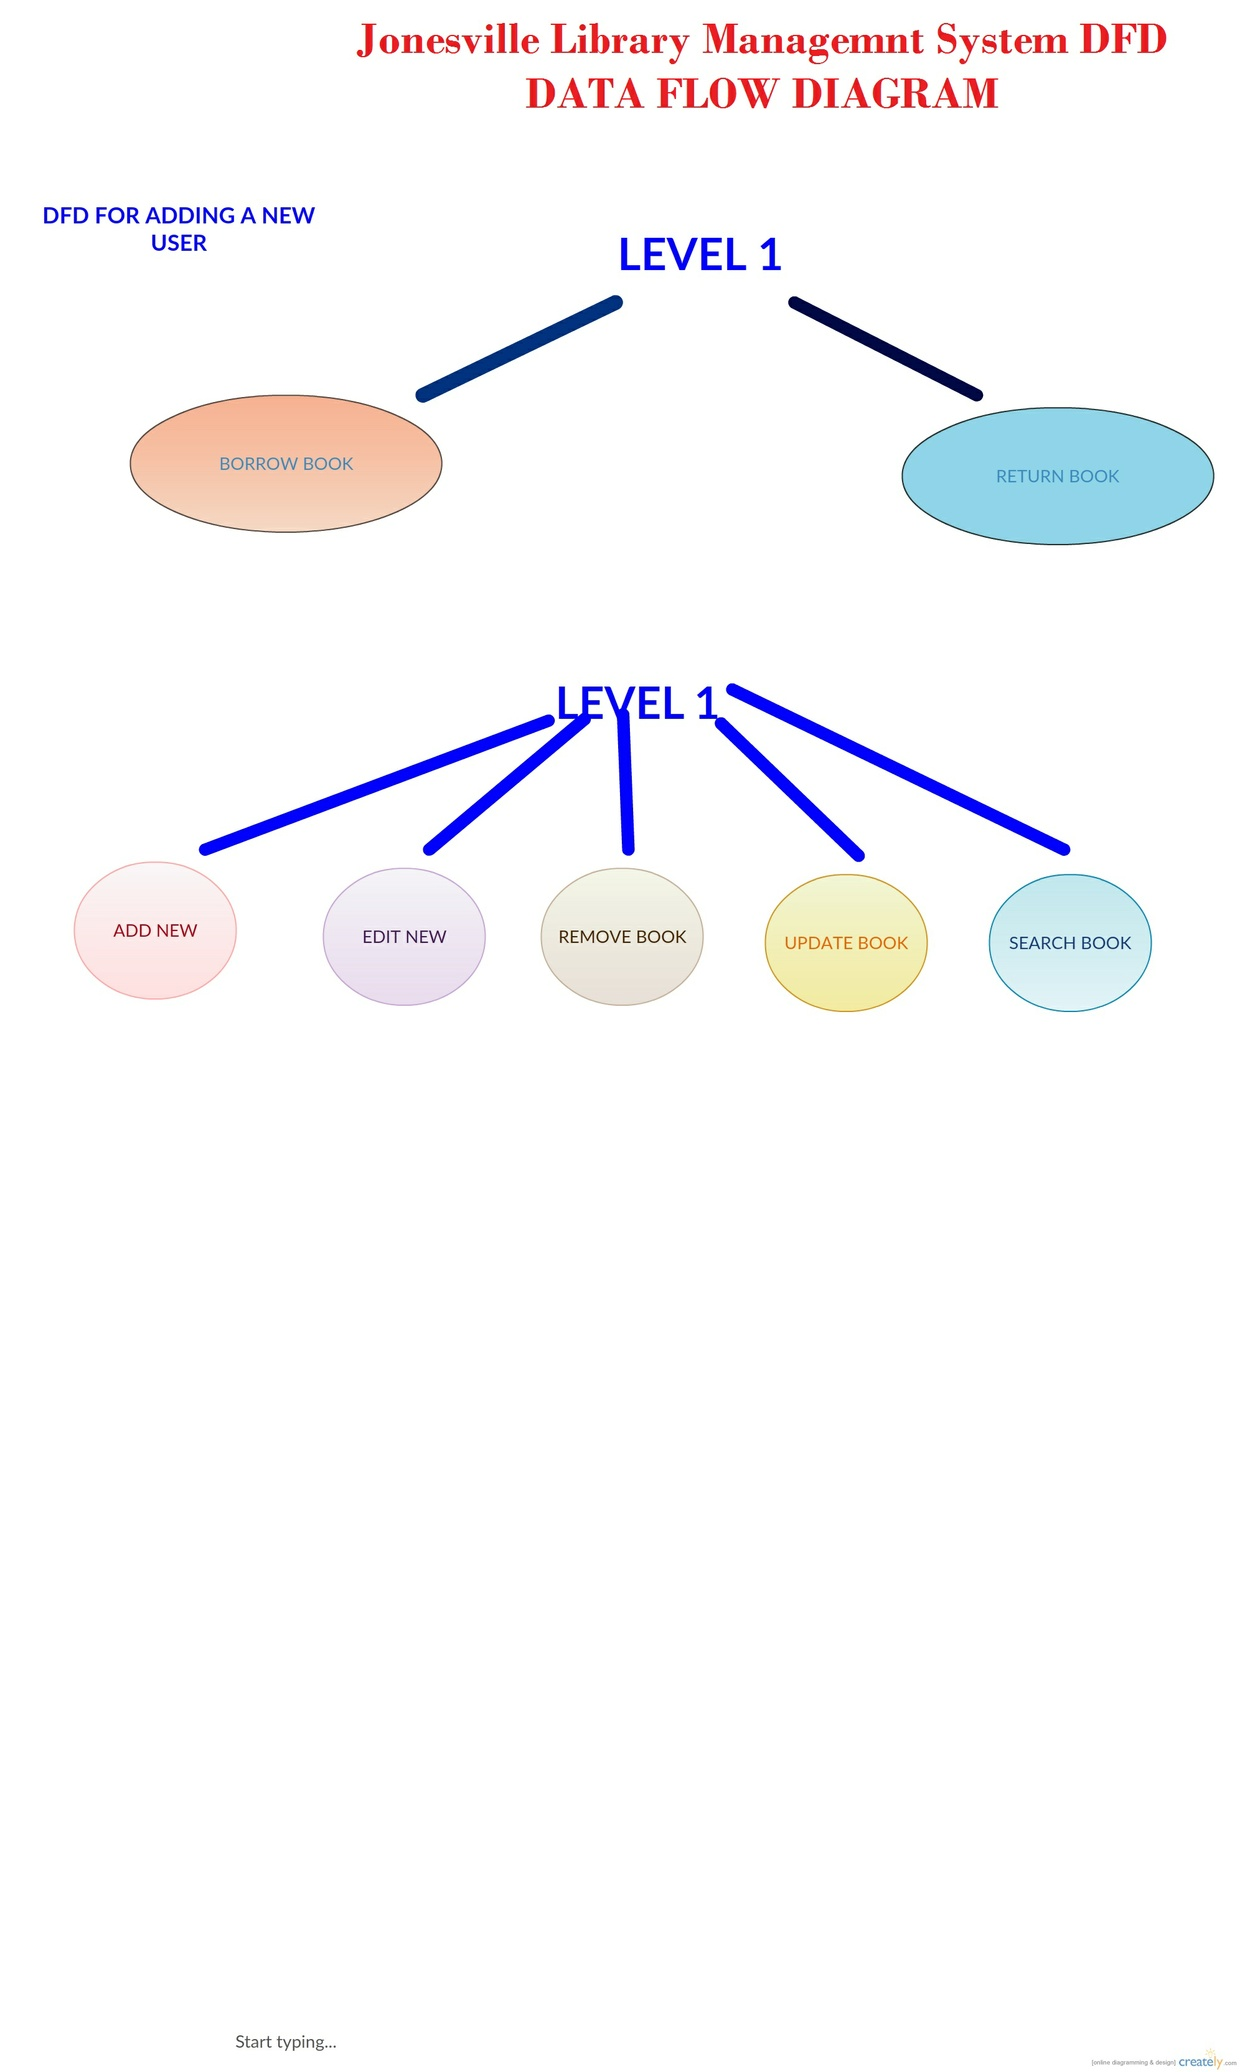 level 0 data flow diagram for library management system er diagram b7c0cb94c4344c039279975f22e445be level 0 data flow - Context Diagram For Library System